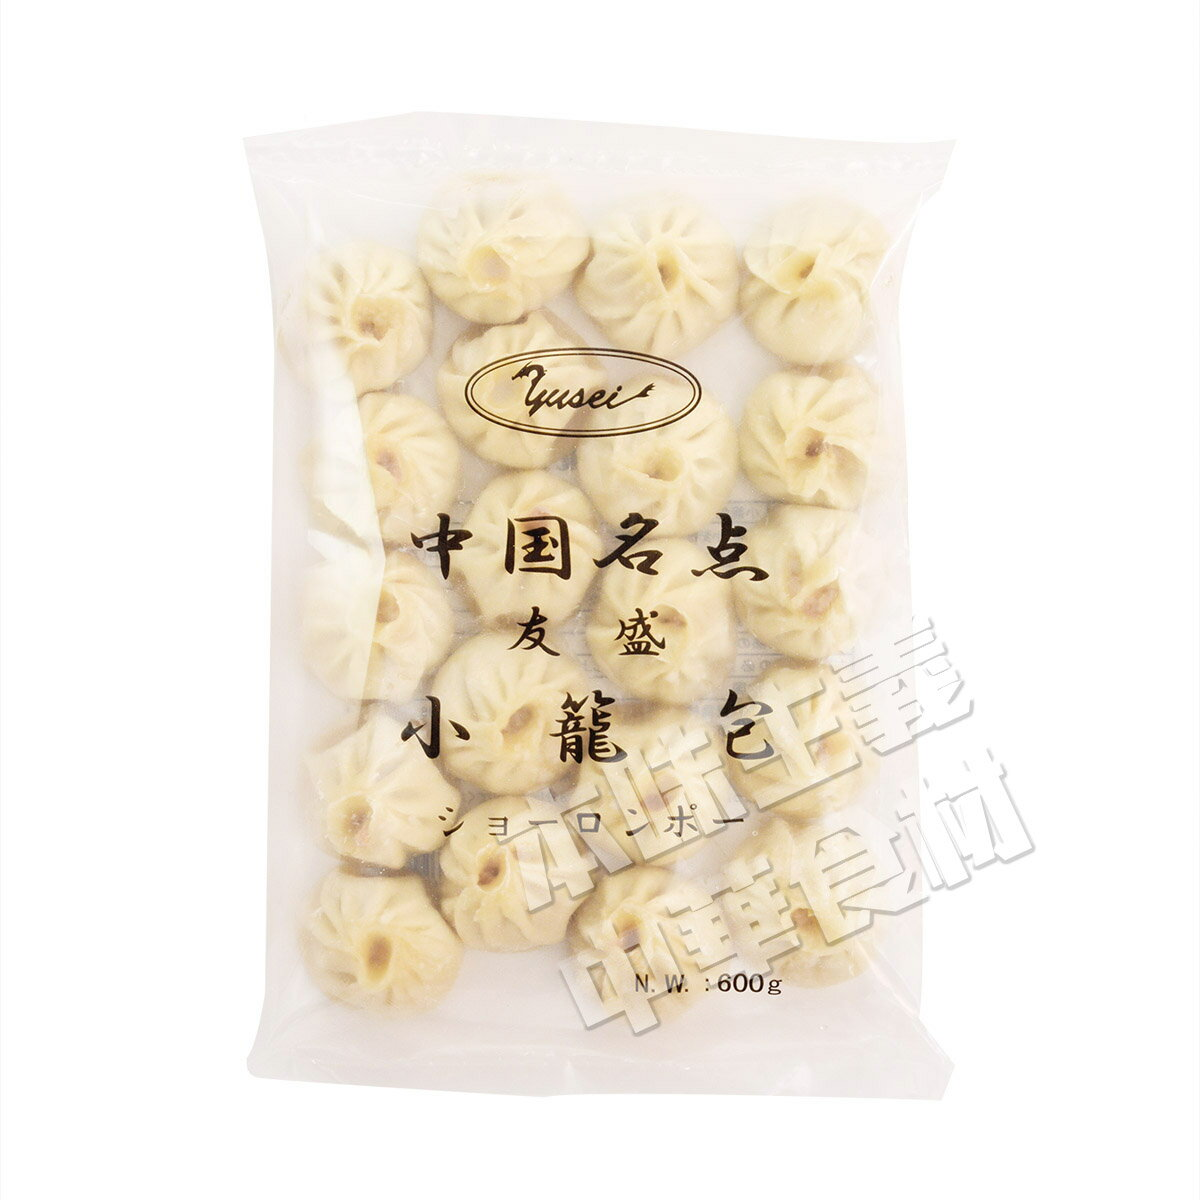 友盛特色小籠包(ショーロンポー)中華料理人気商品・中国名物・定番お土産